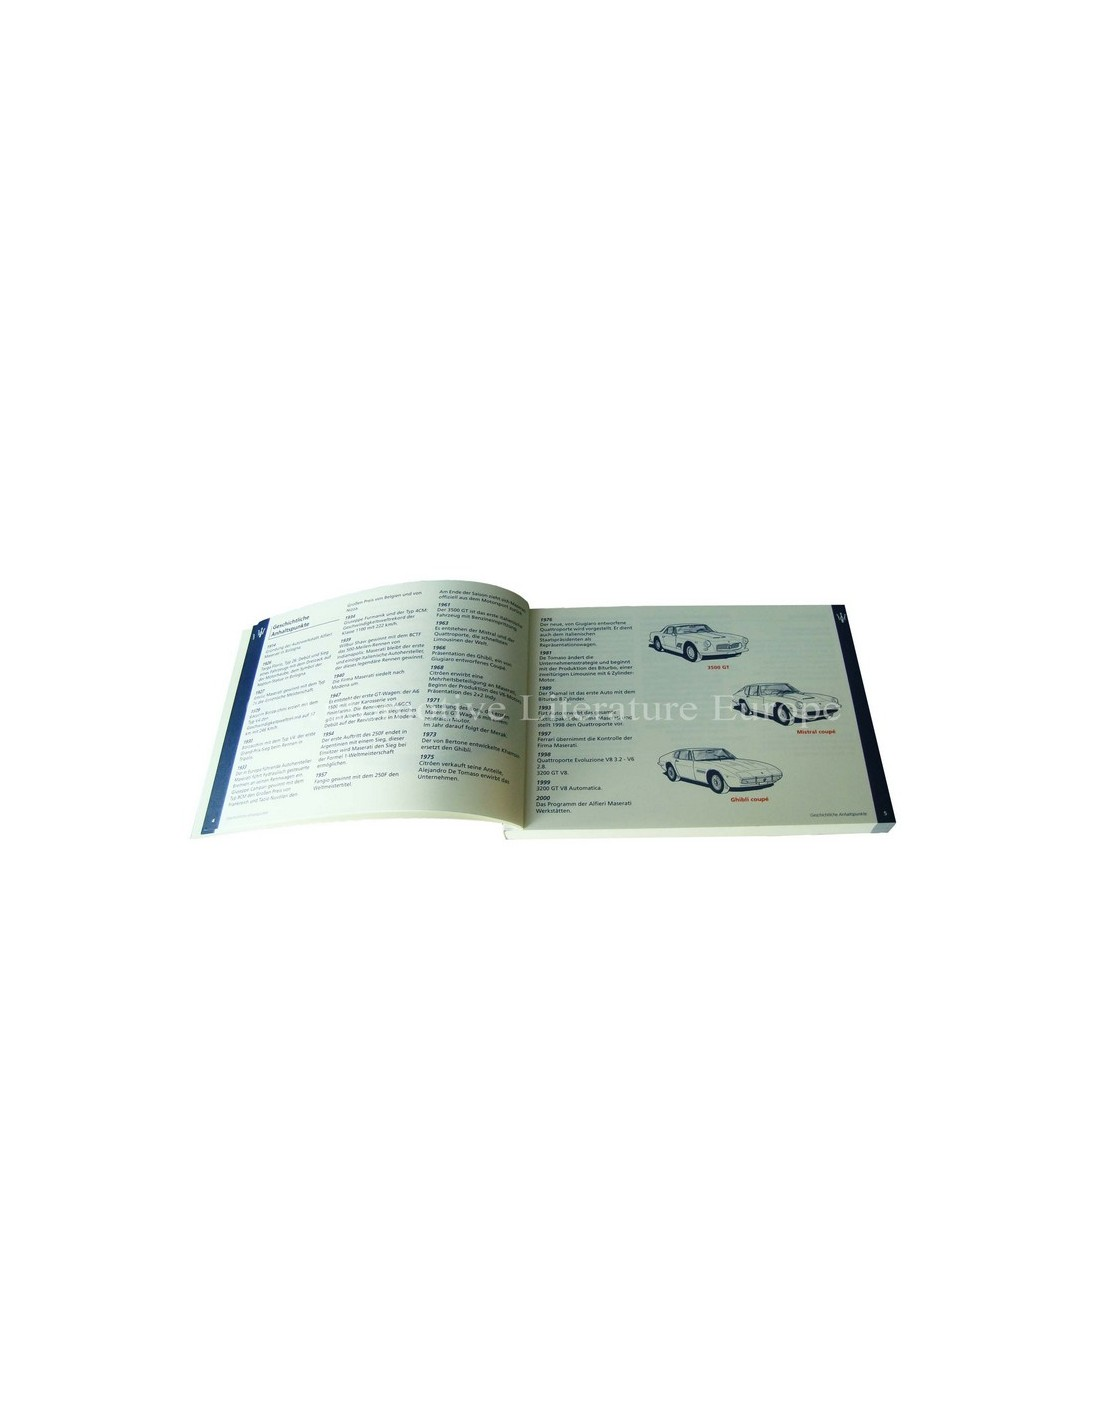 vortex mercury spa instruction manual